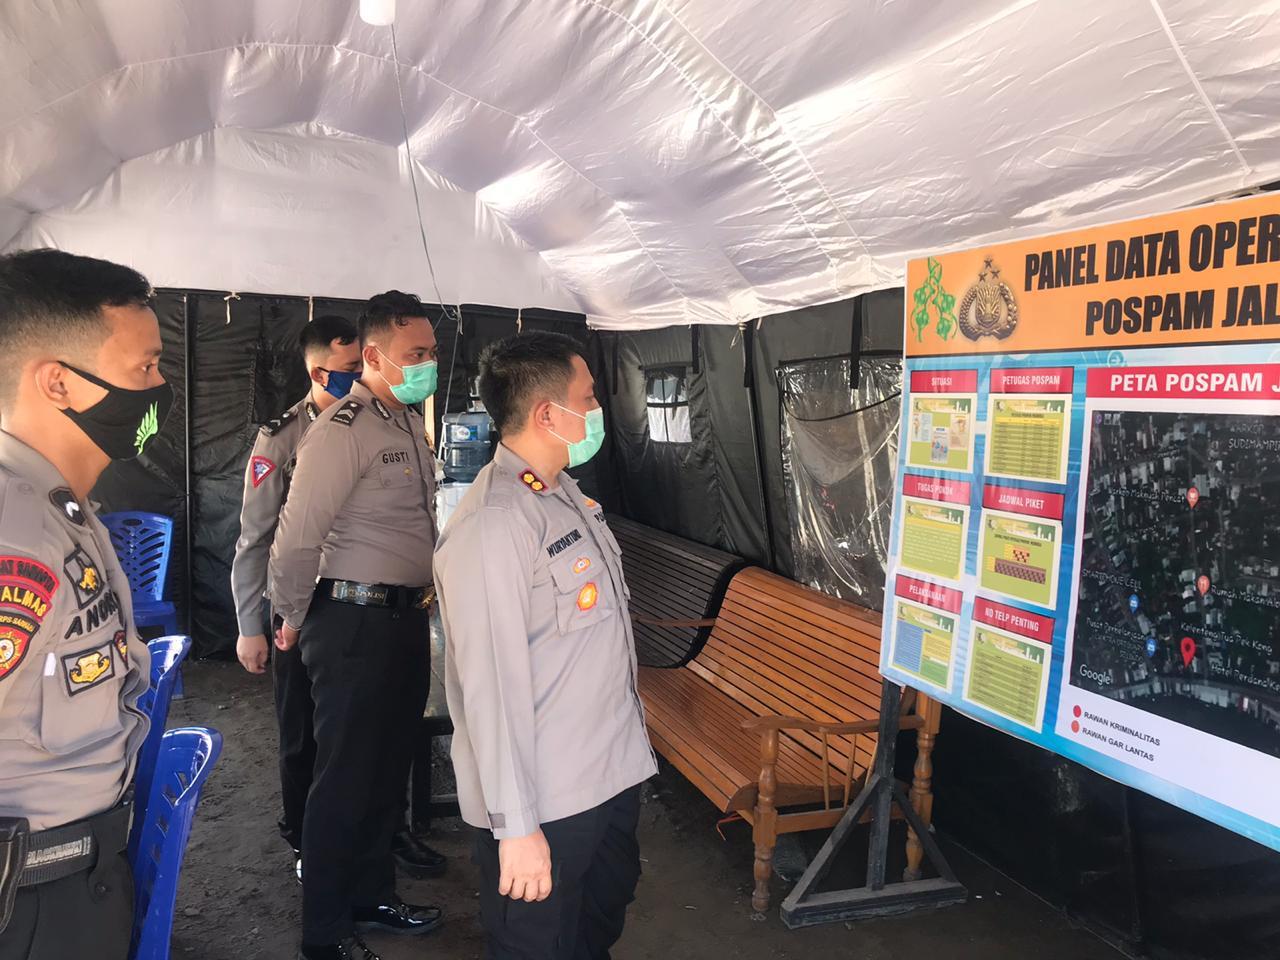 Kapolres Ketapang Cek Langsung Pos Pam Dan Pos Yan Ops Ketupat Kapuas 2020